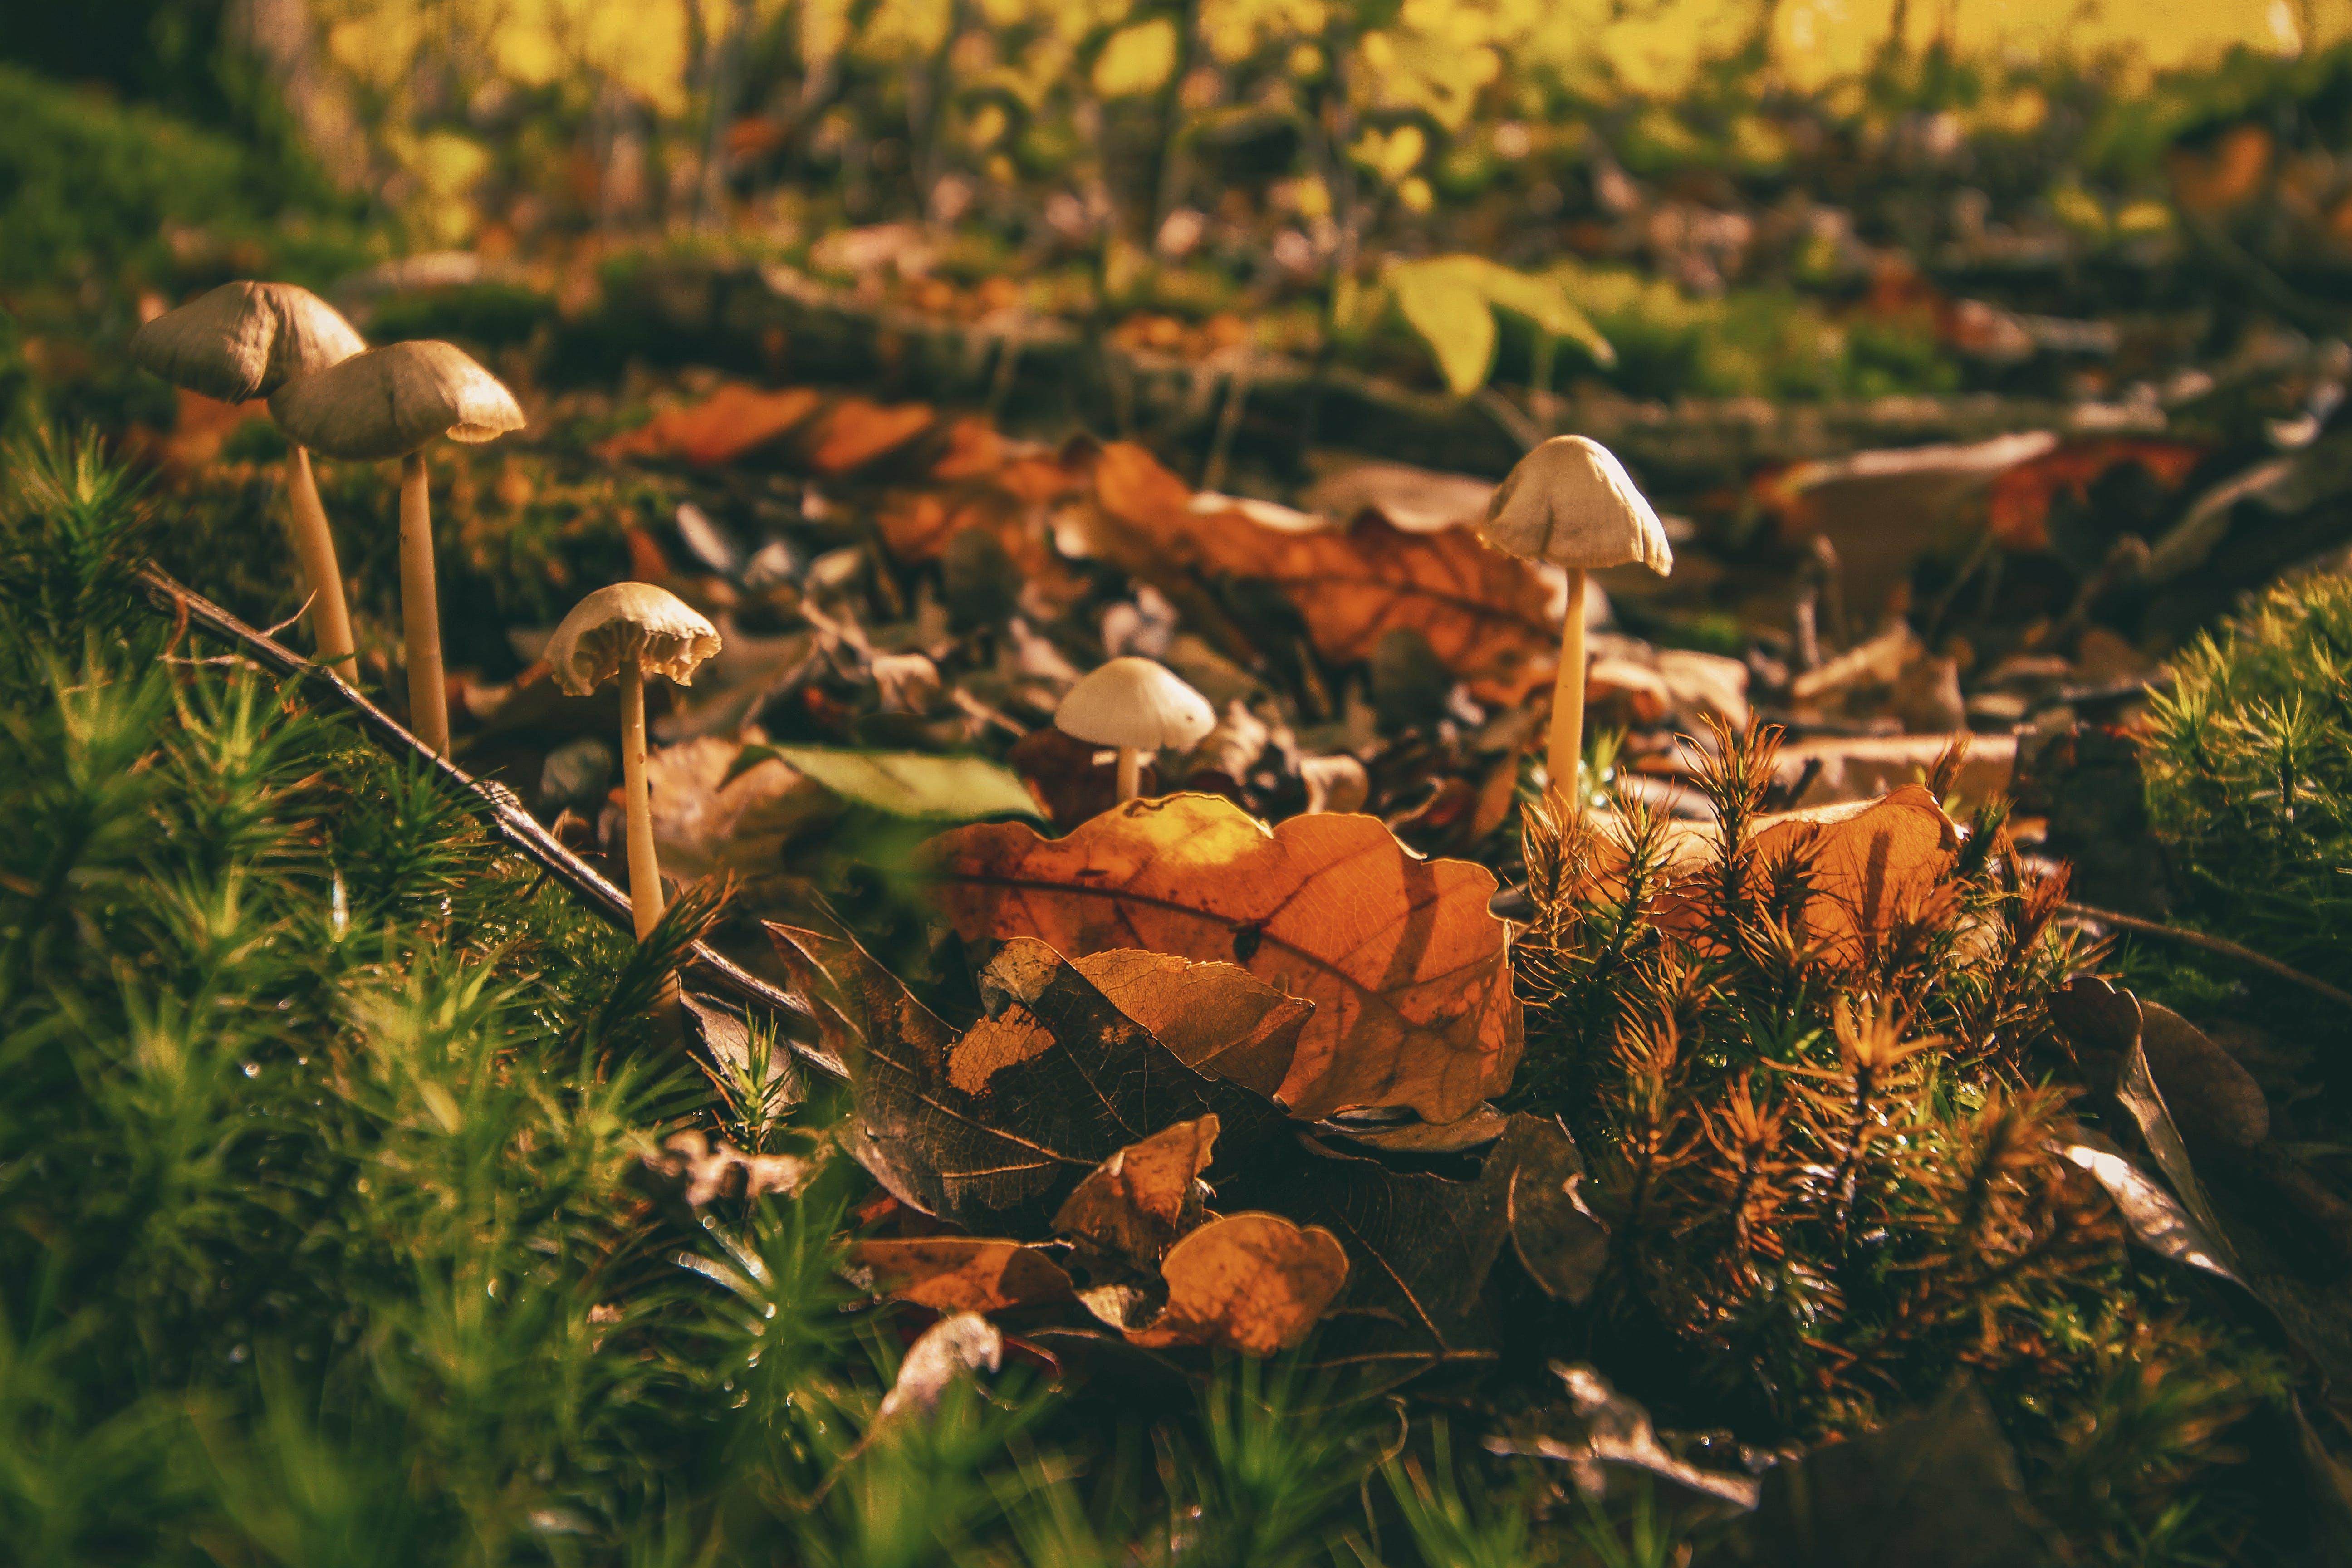 Mushrooms on Pile of Dried Leaves